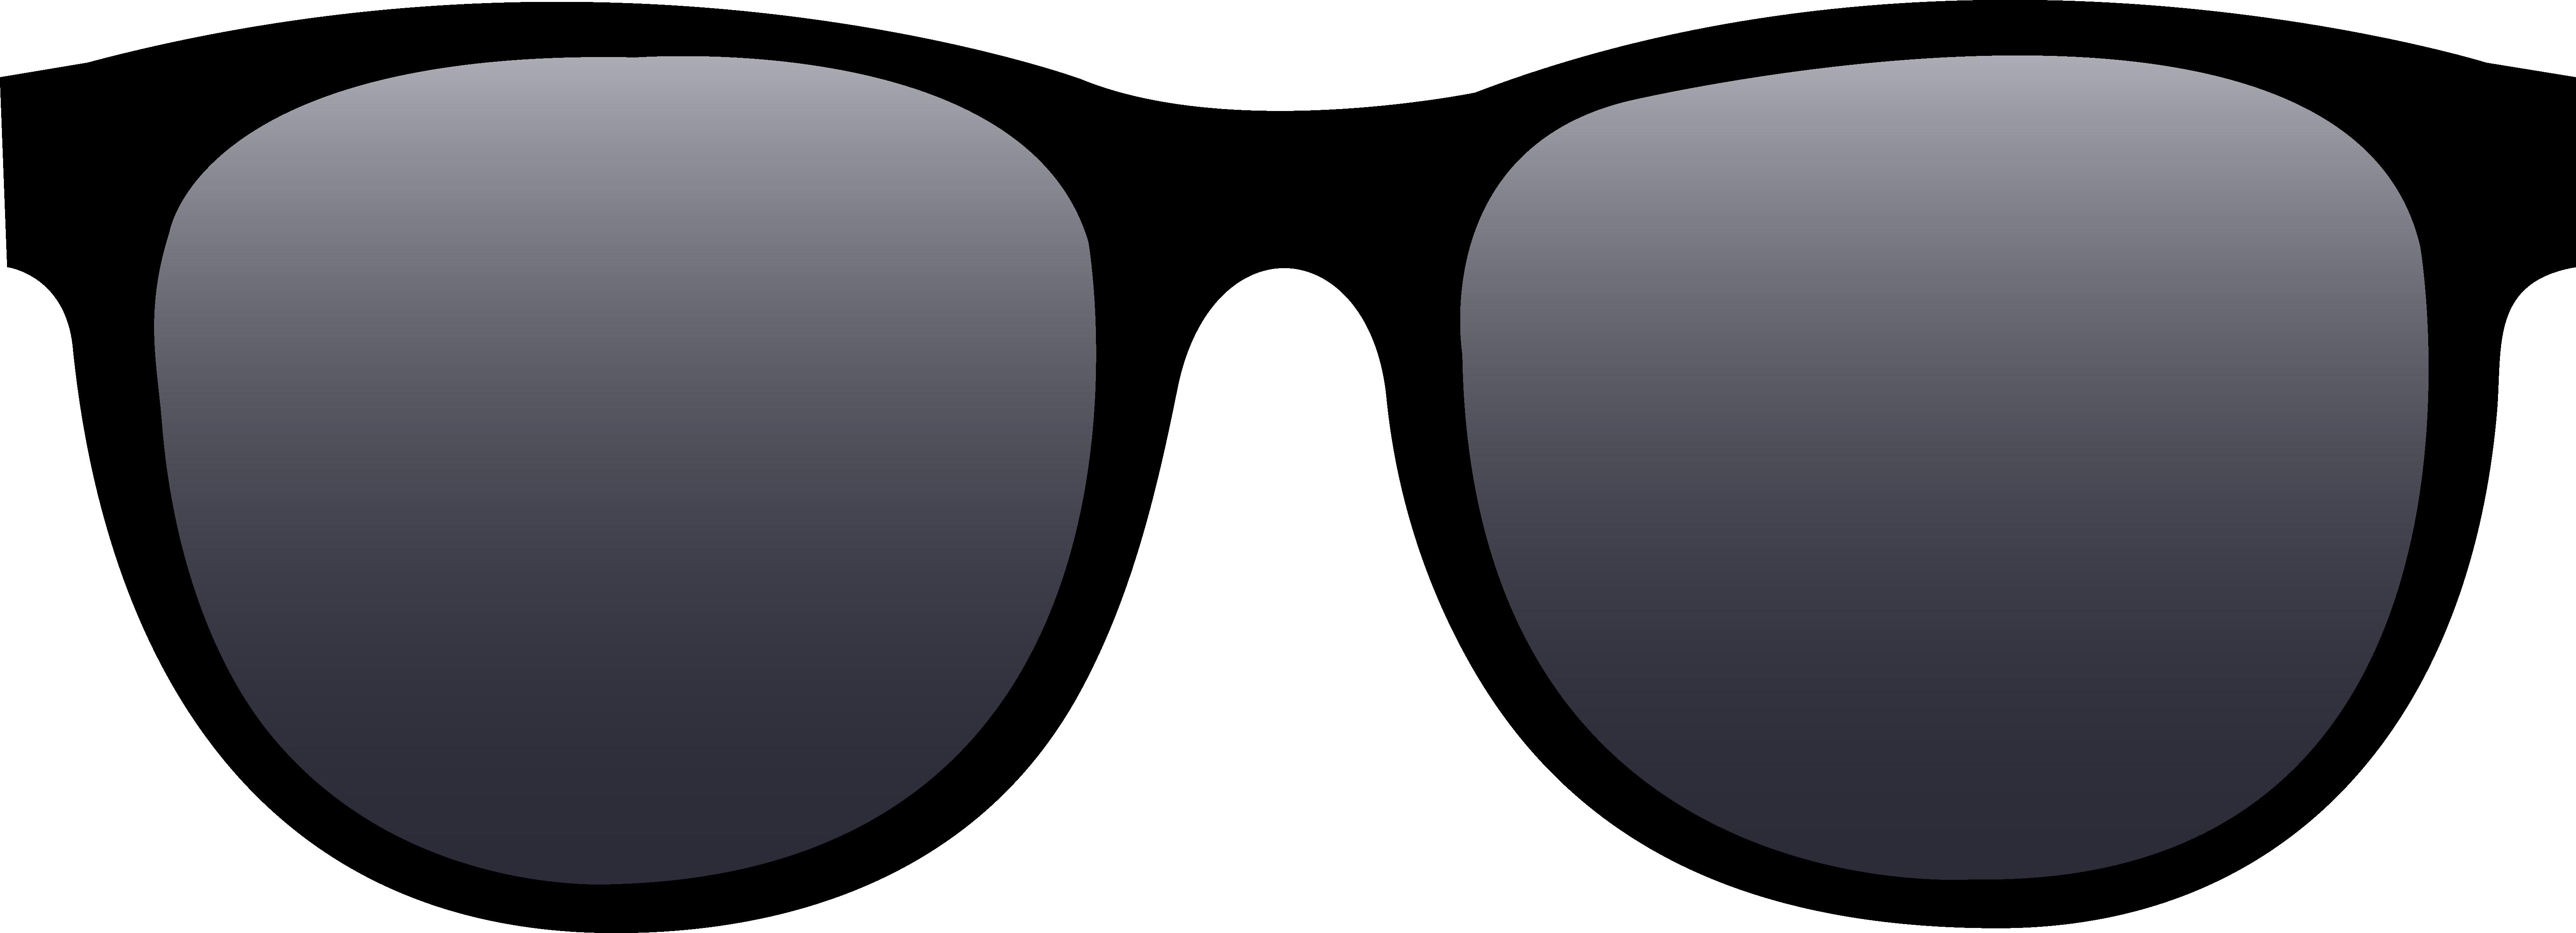 Sun Glasses Images - Cliparts.co